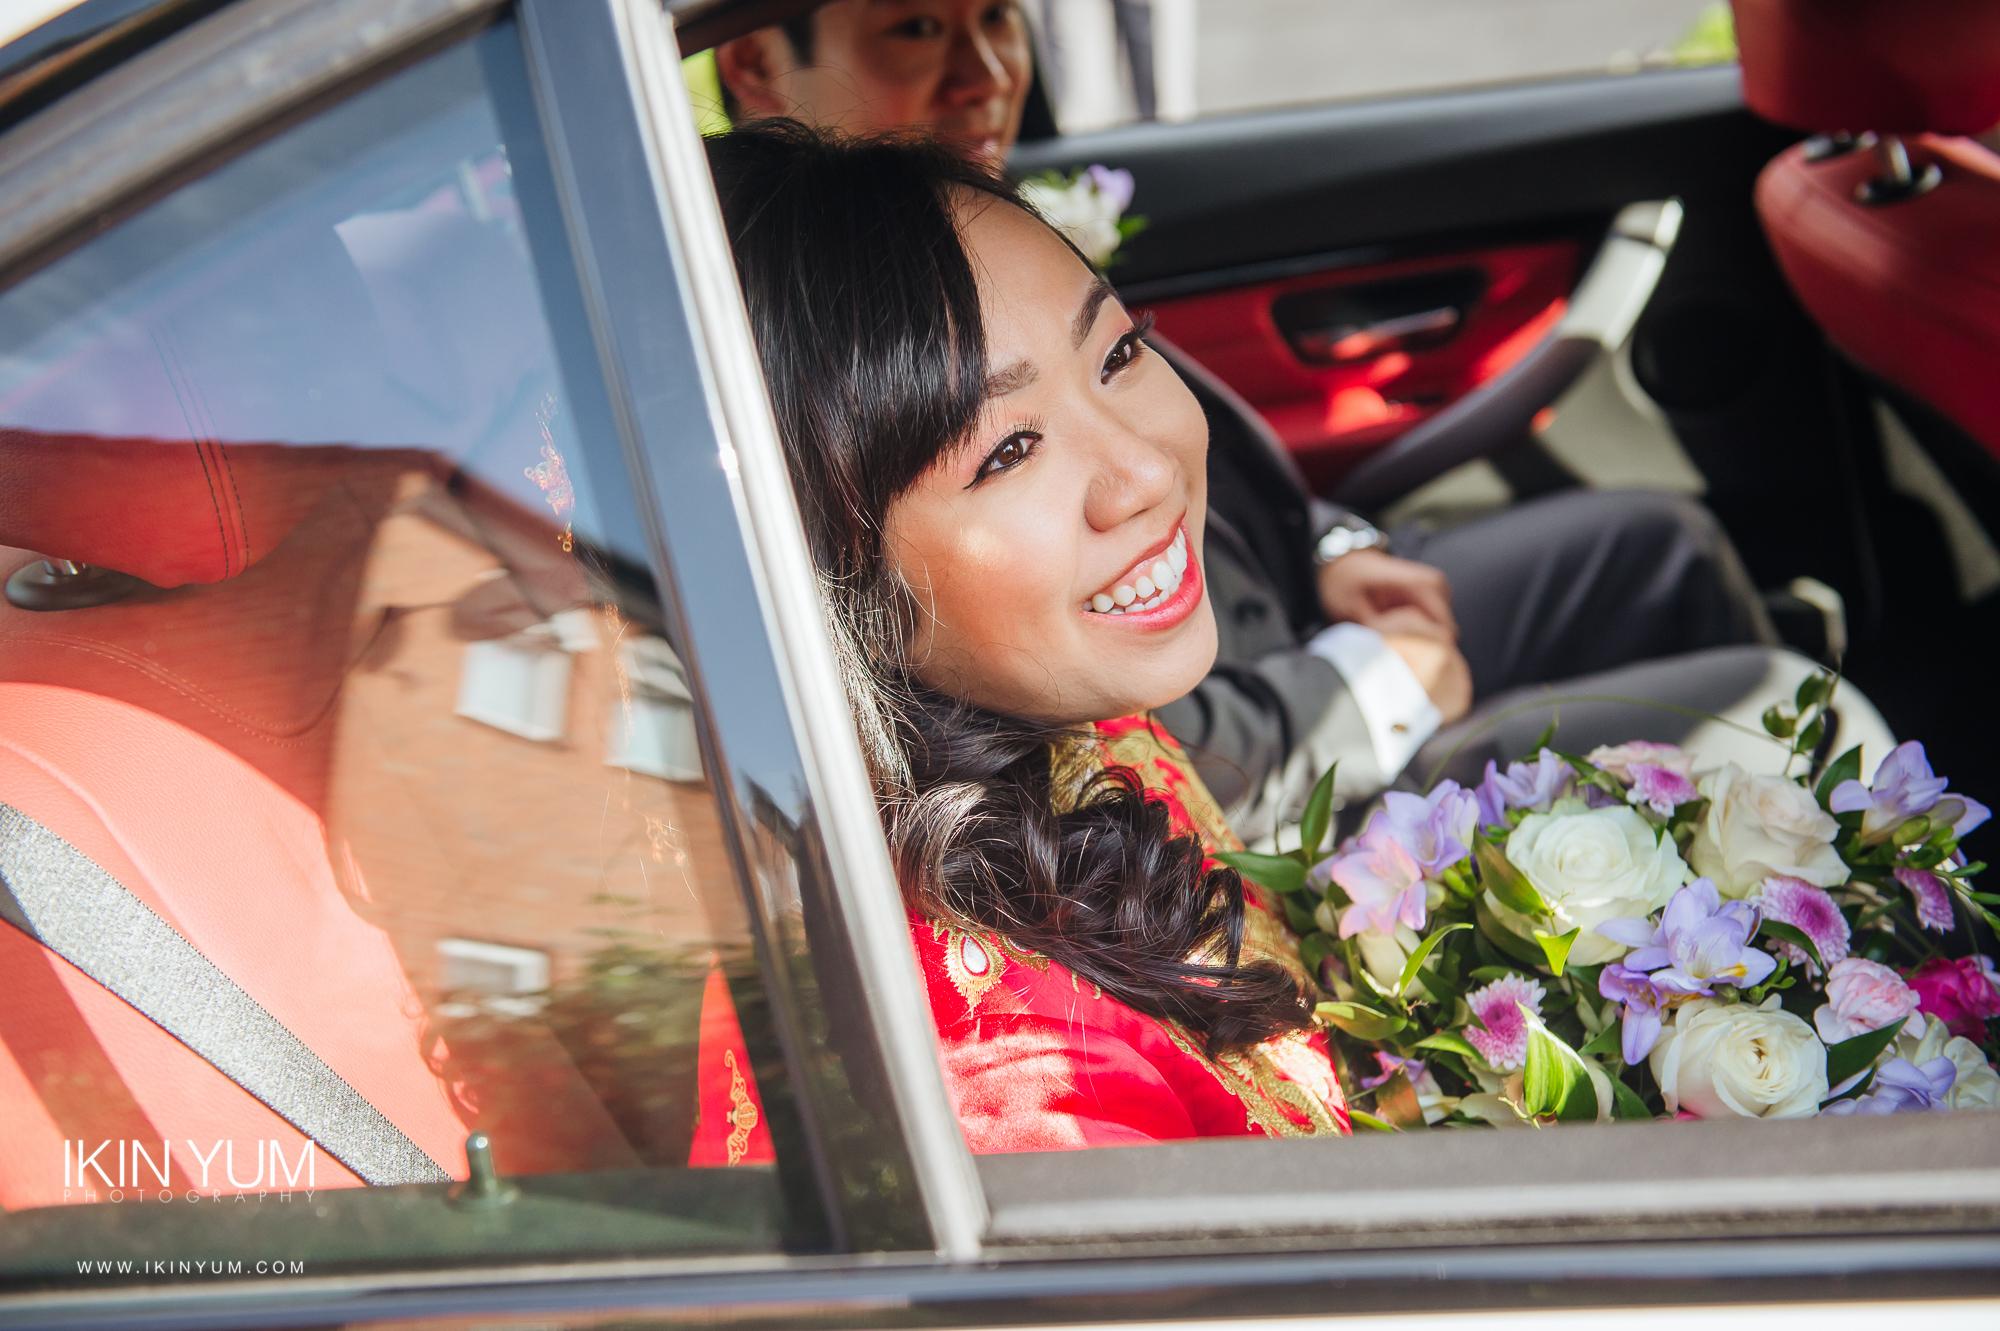 Hampton Manor Wedding - Ikin Yum Photography -040.jpg